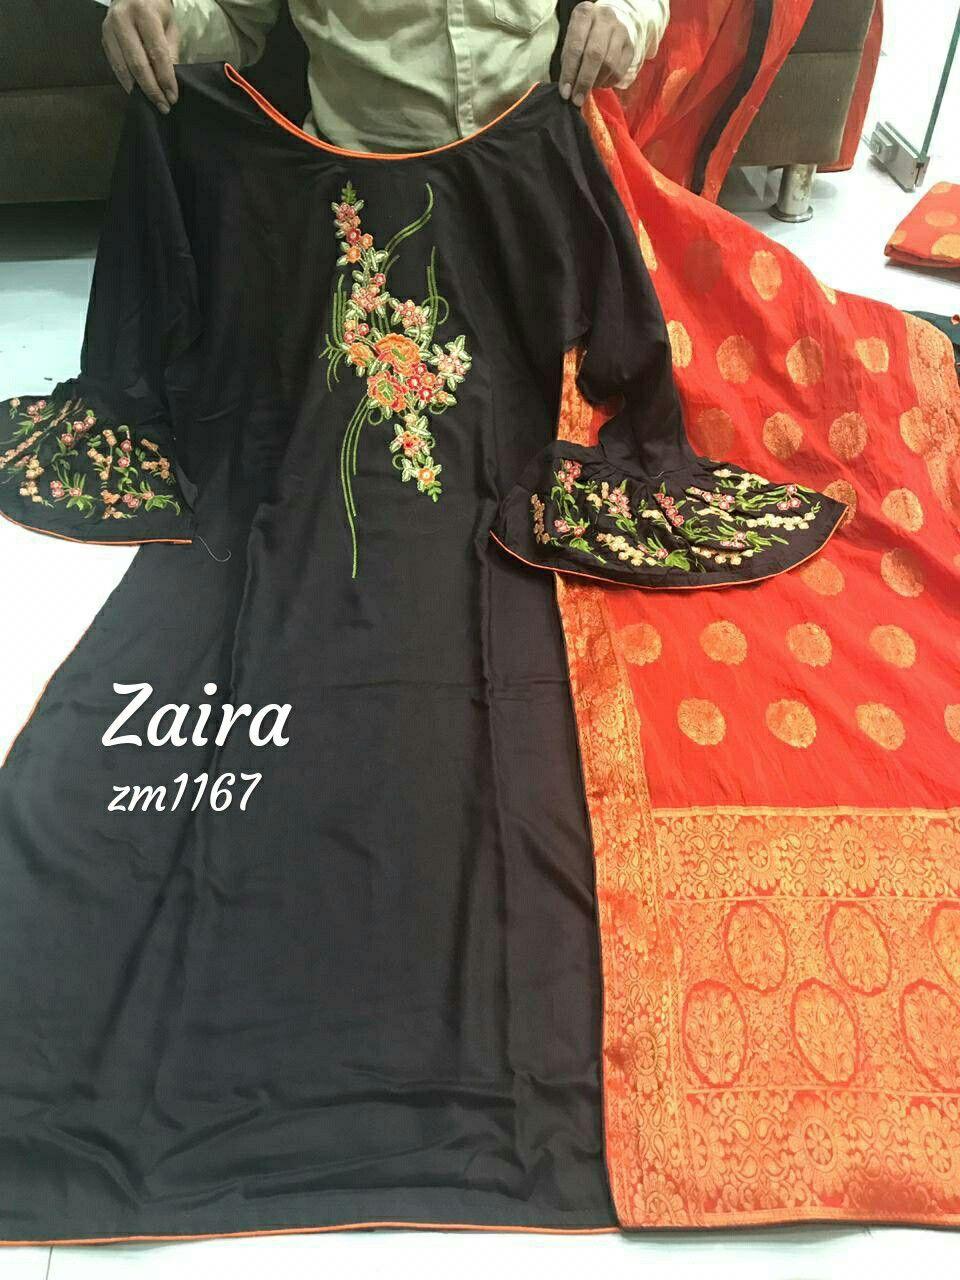 for Order or inquiry call or wap+919512649968#ootd #weddingwear #kurtisonline #blousedesigns #dressmaterial #indianbride #kurtilove #ethnicwear #designerclothes #kurtisconner #kurticrepe #designerkurtis #kurtimalaysia #indiancouture #chennai #wedding #kurticantik #partywear #desiwedding #kurtas #kurtishaj #kurtiwholesale #indianweddingbuzz #weddingsofinstagram #pakistanisuits #bridalentry #ratibeauty #goldjewellery #salwar #weddinglehenga